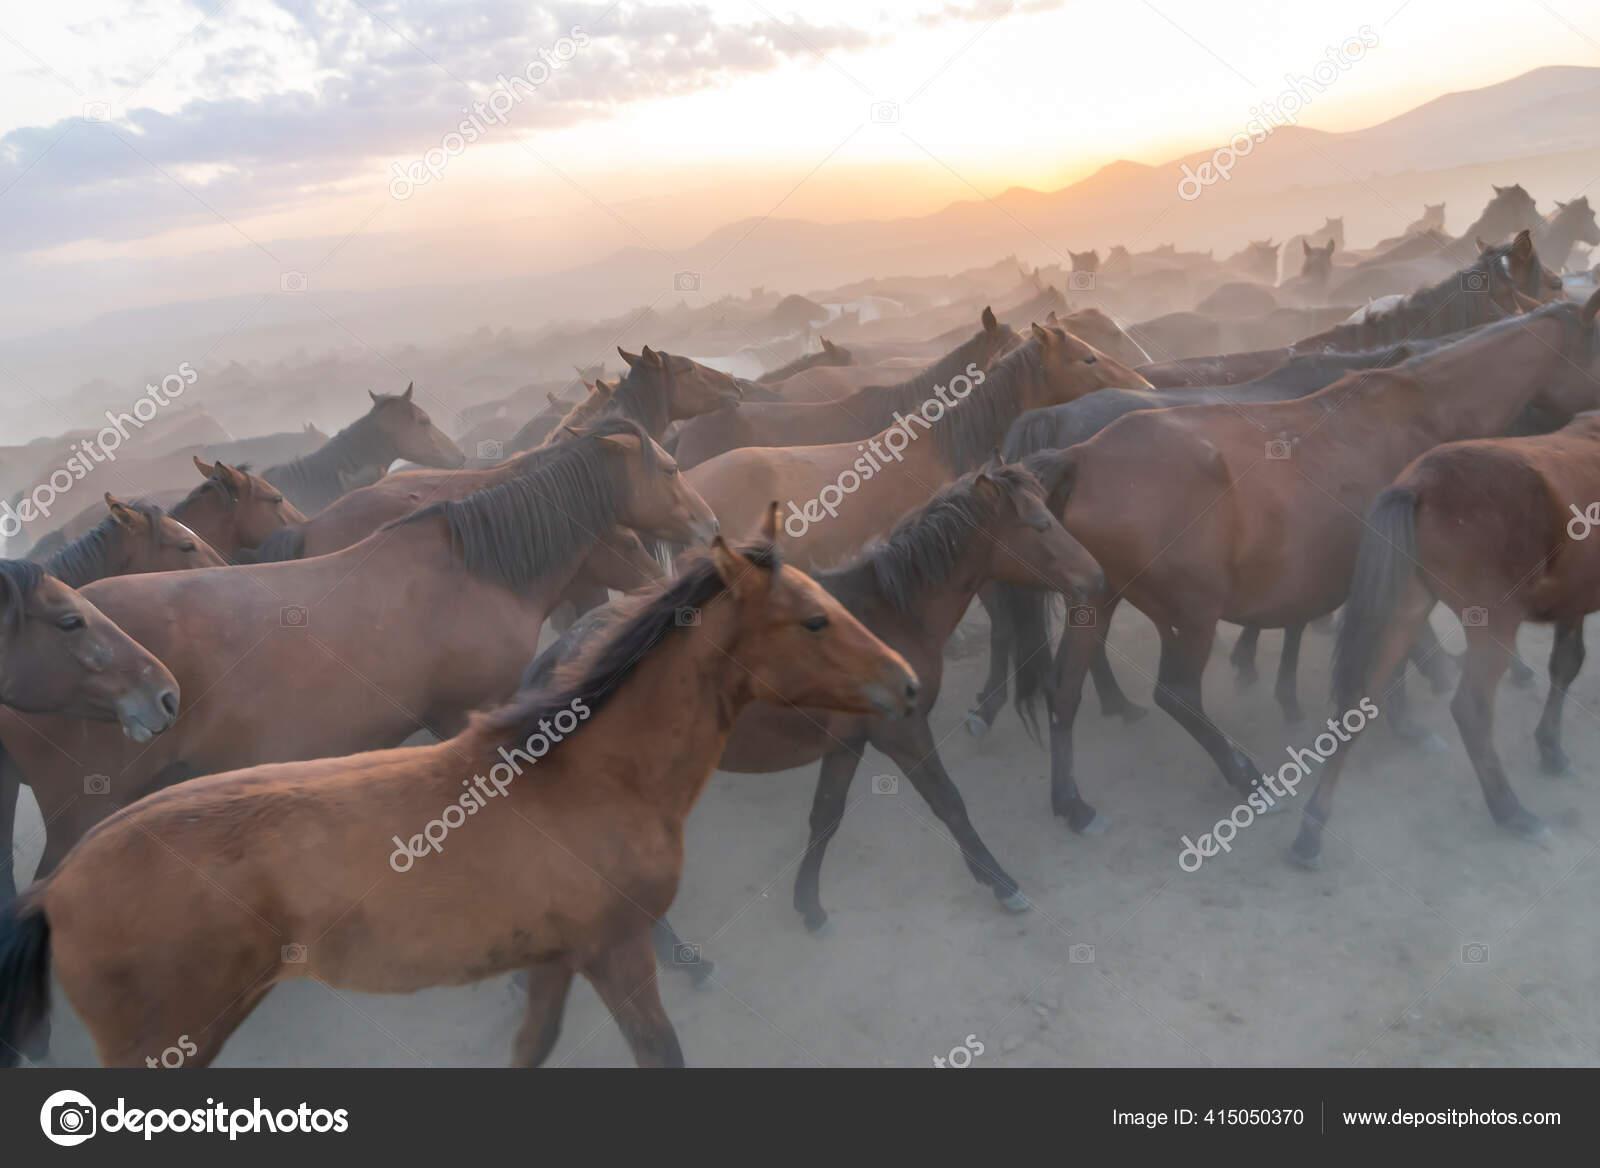 Wild Horses Run Foggy Sunset Wild Horses Running Dust Hormetci Stock Photo C Attractionart 415050370